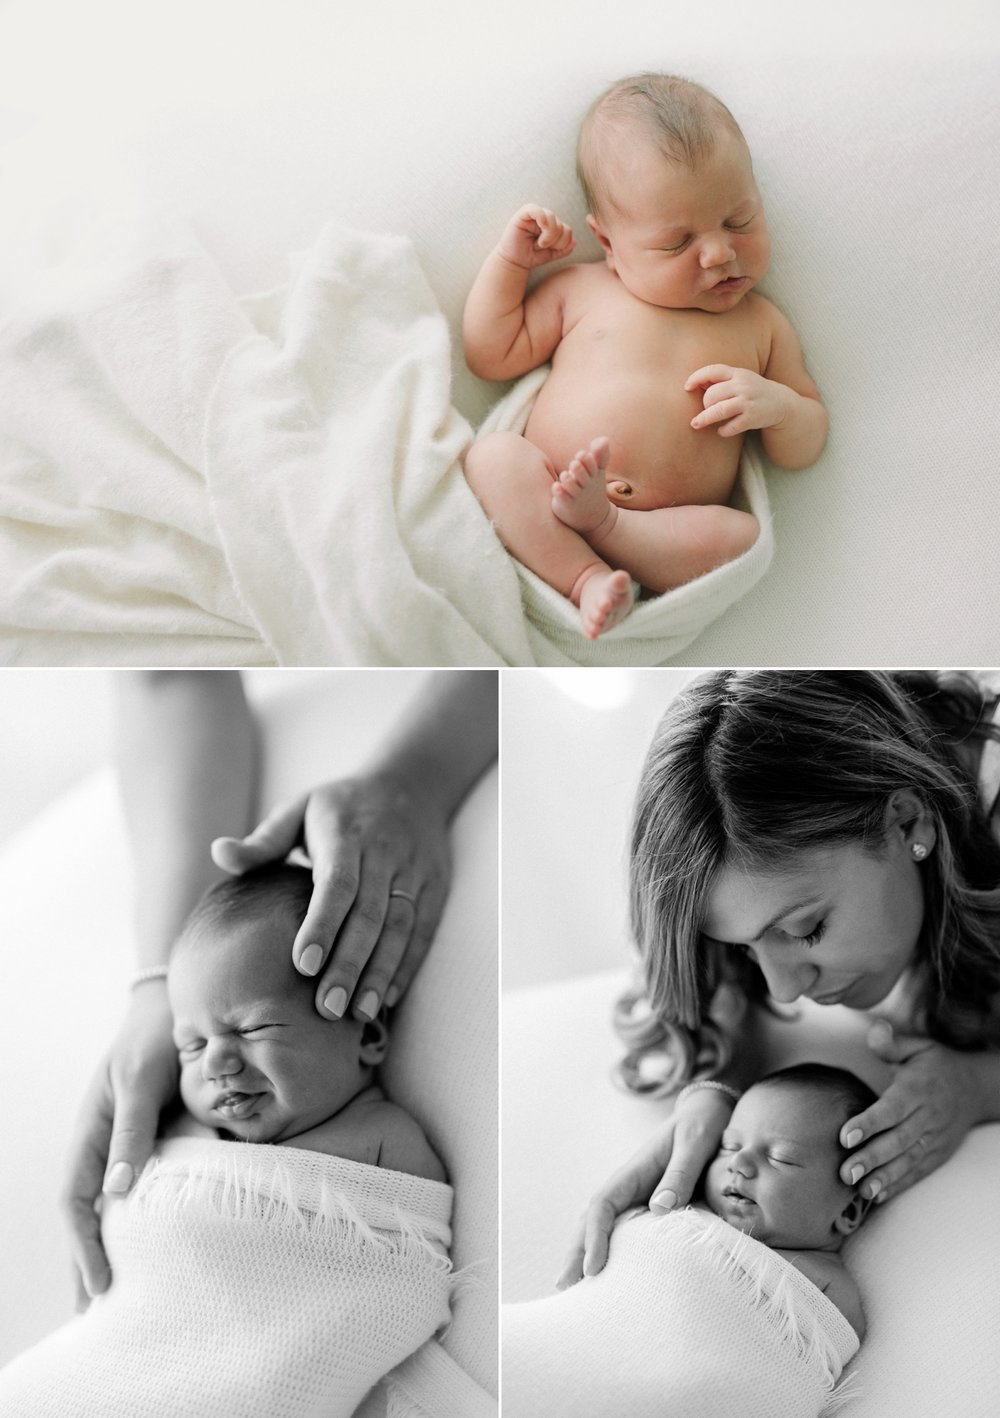 Baby Vivienne - Natural Newborn Photography in Adelaide - Simple, Modern and Beautiful Newborn Photographer - Katherine Schultz - www.katherineschultzphotography.com_0028.jpg